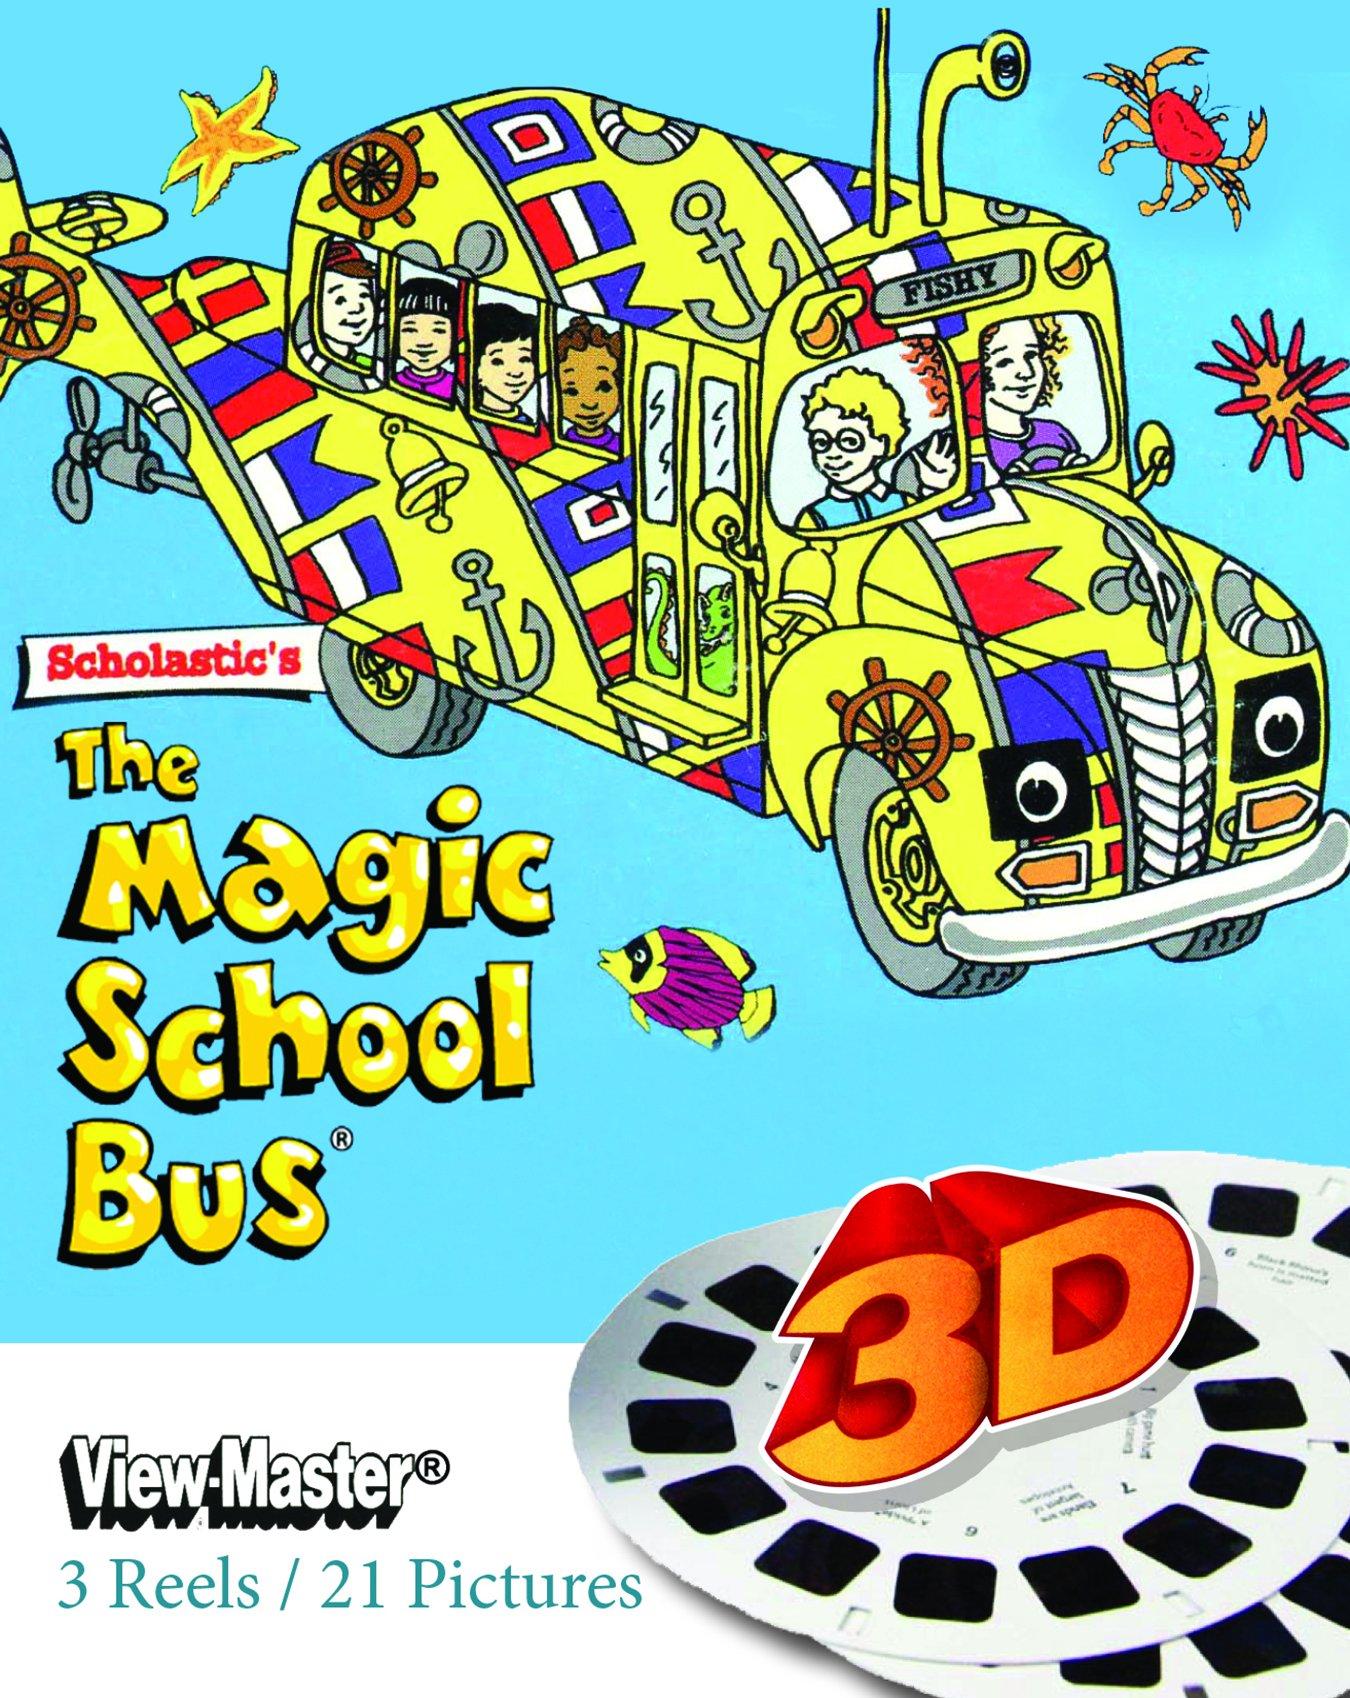 Magic School Bus - Classic ViewMaster - 21 Classic 3D Images - 3 Reel Set